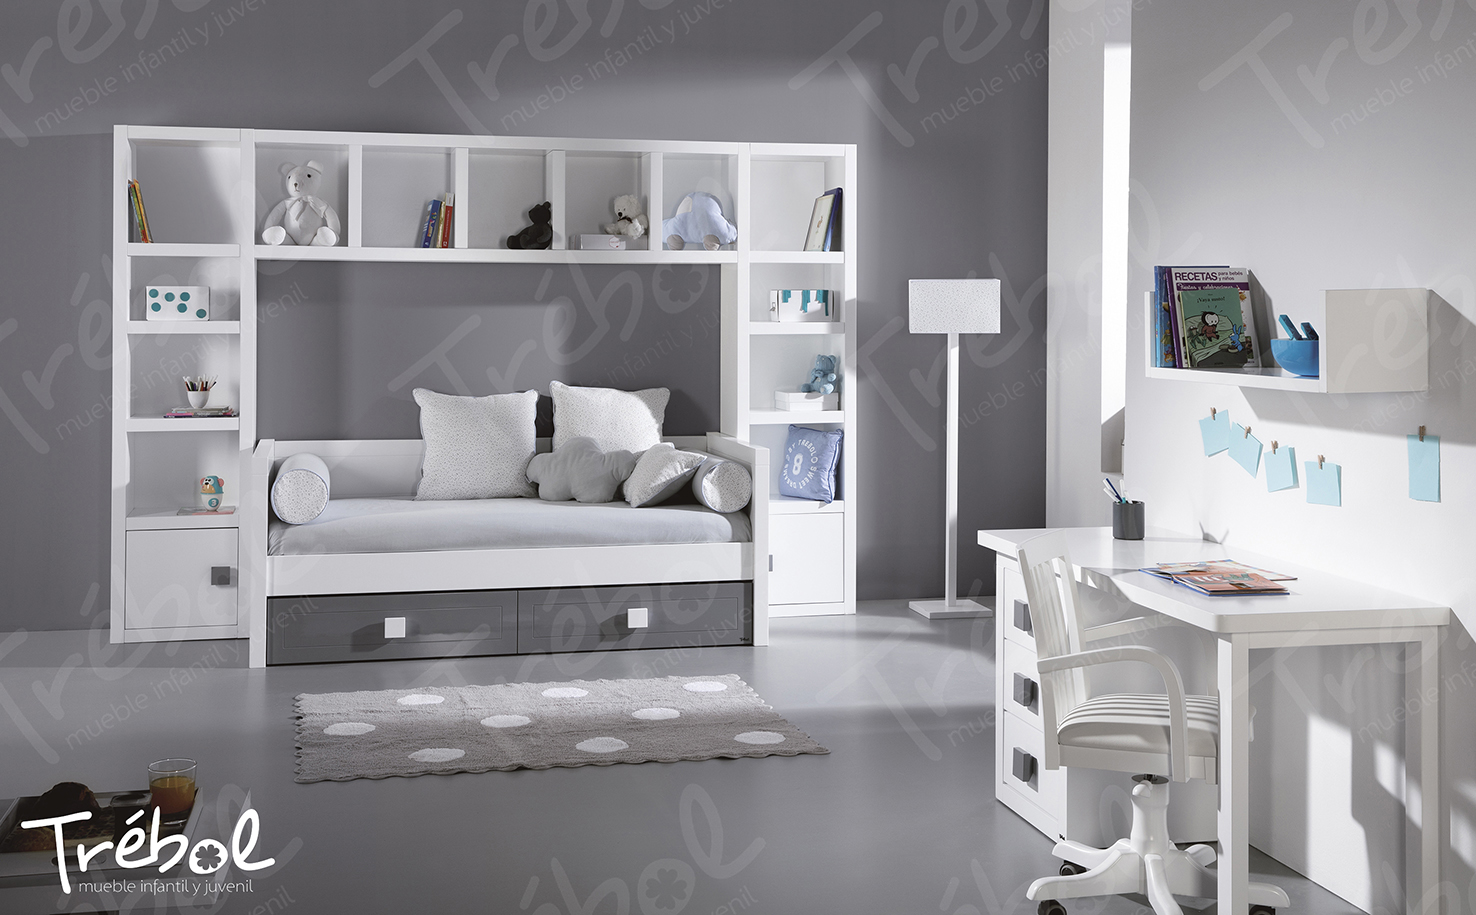 Juvenil 14 tr bol mobiliario tienda decoraci n valencia interiorismo valencia - Mobiliario infantil valencia ...